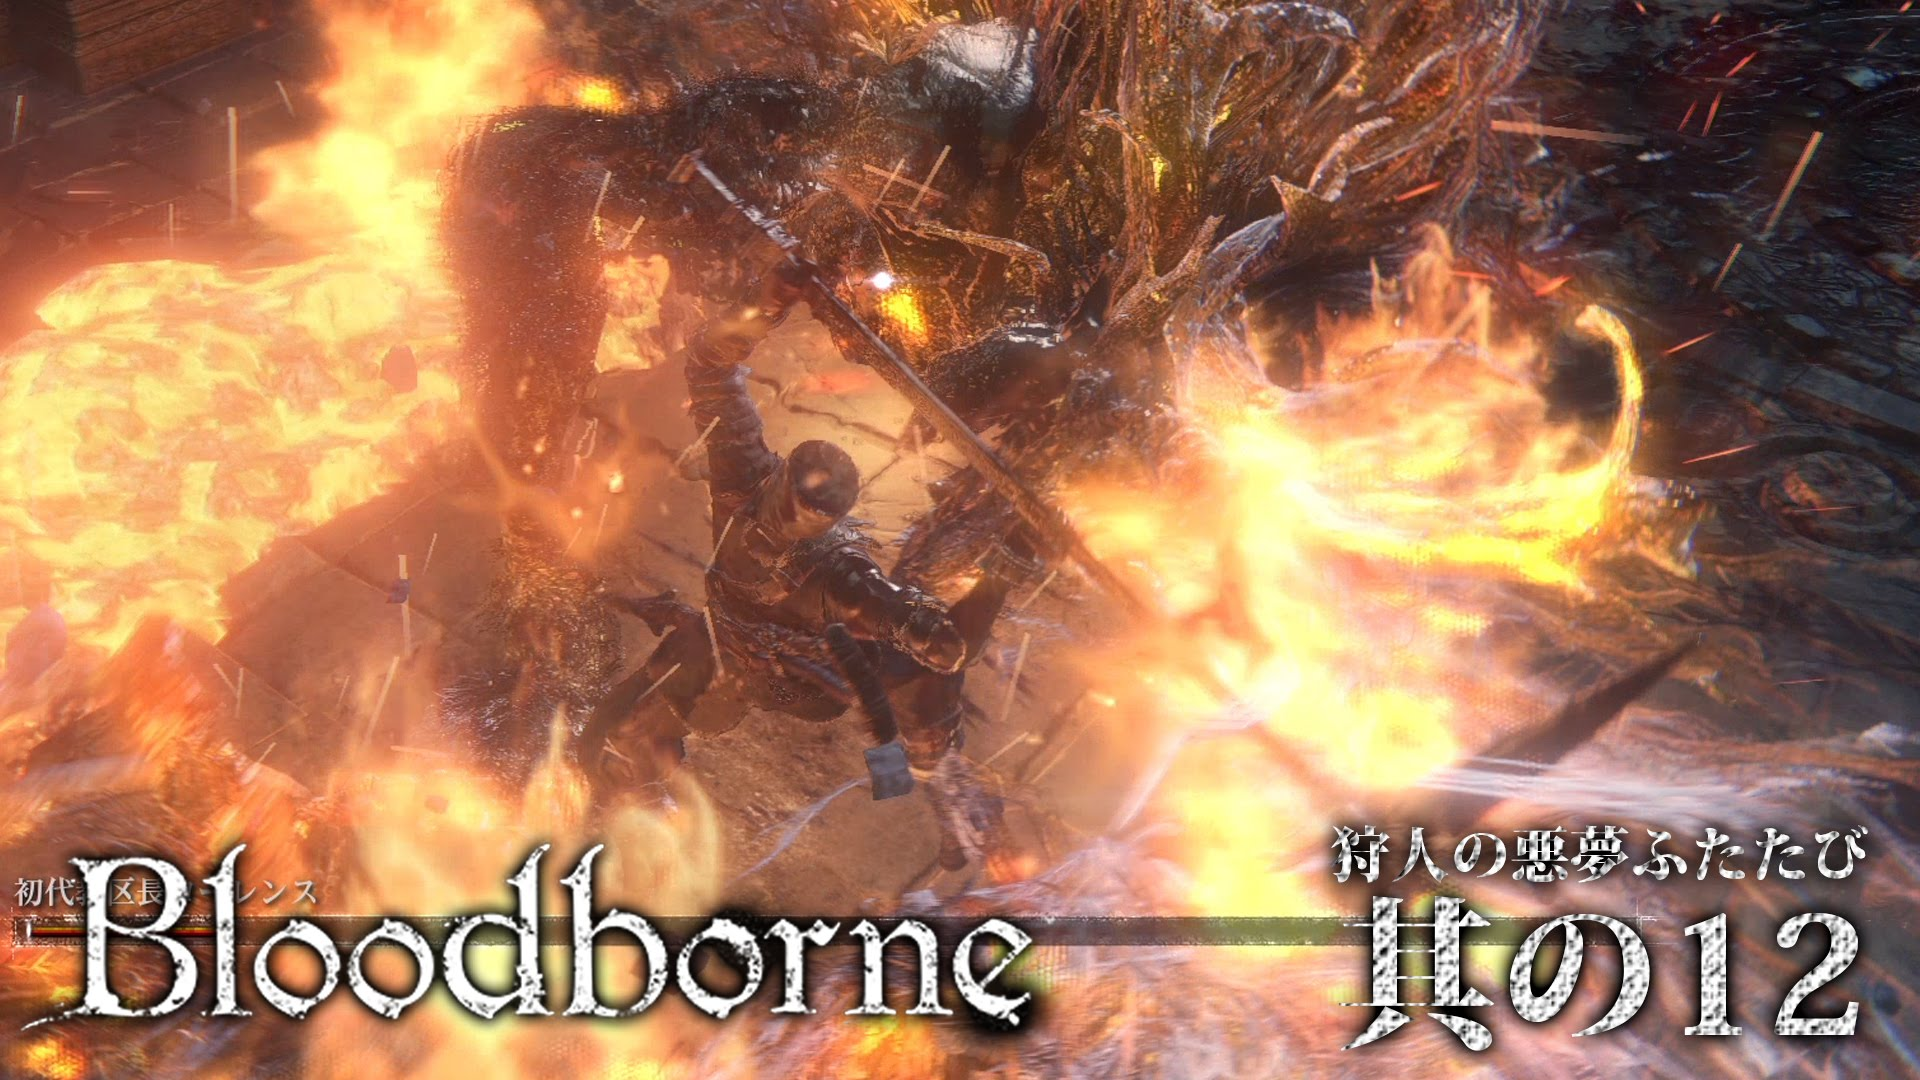 Bloodborne The Old Hunters #12【初代教区長ローレンス】